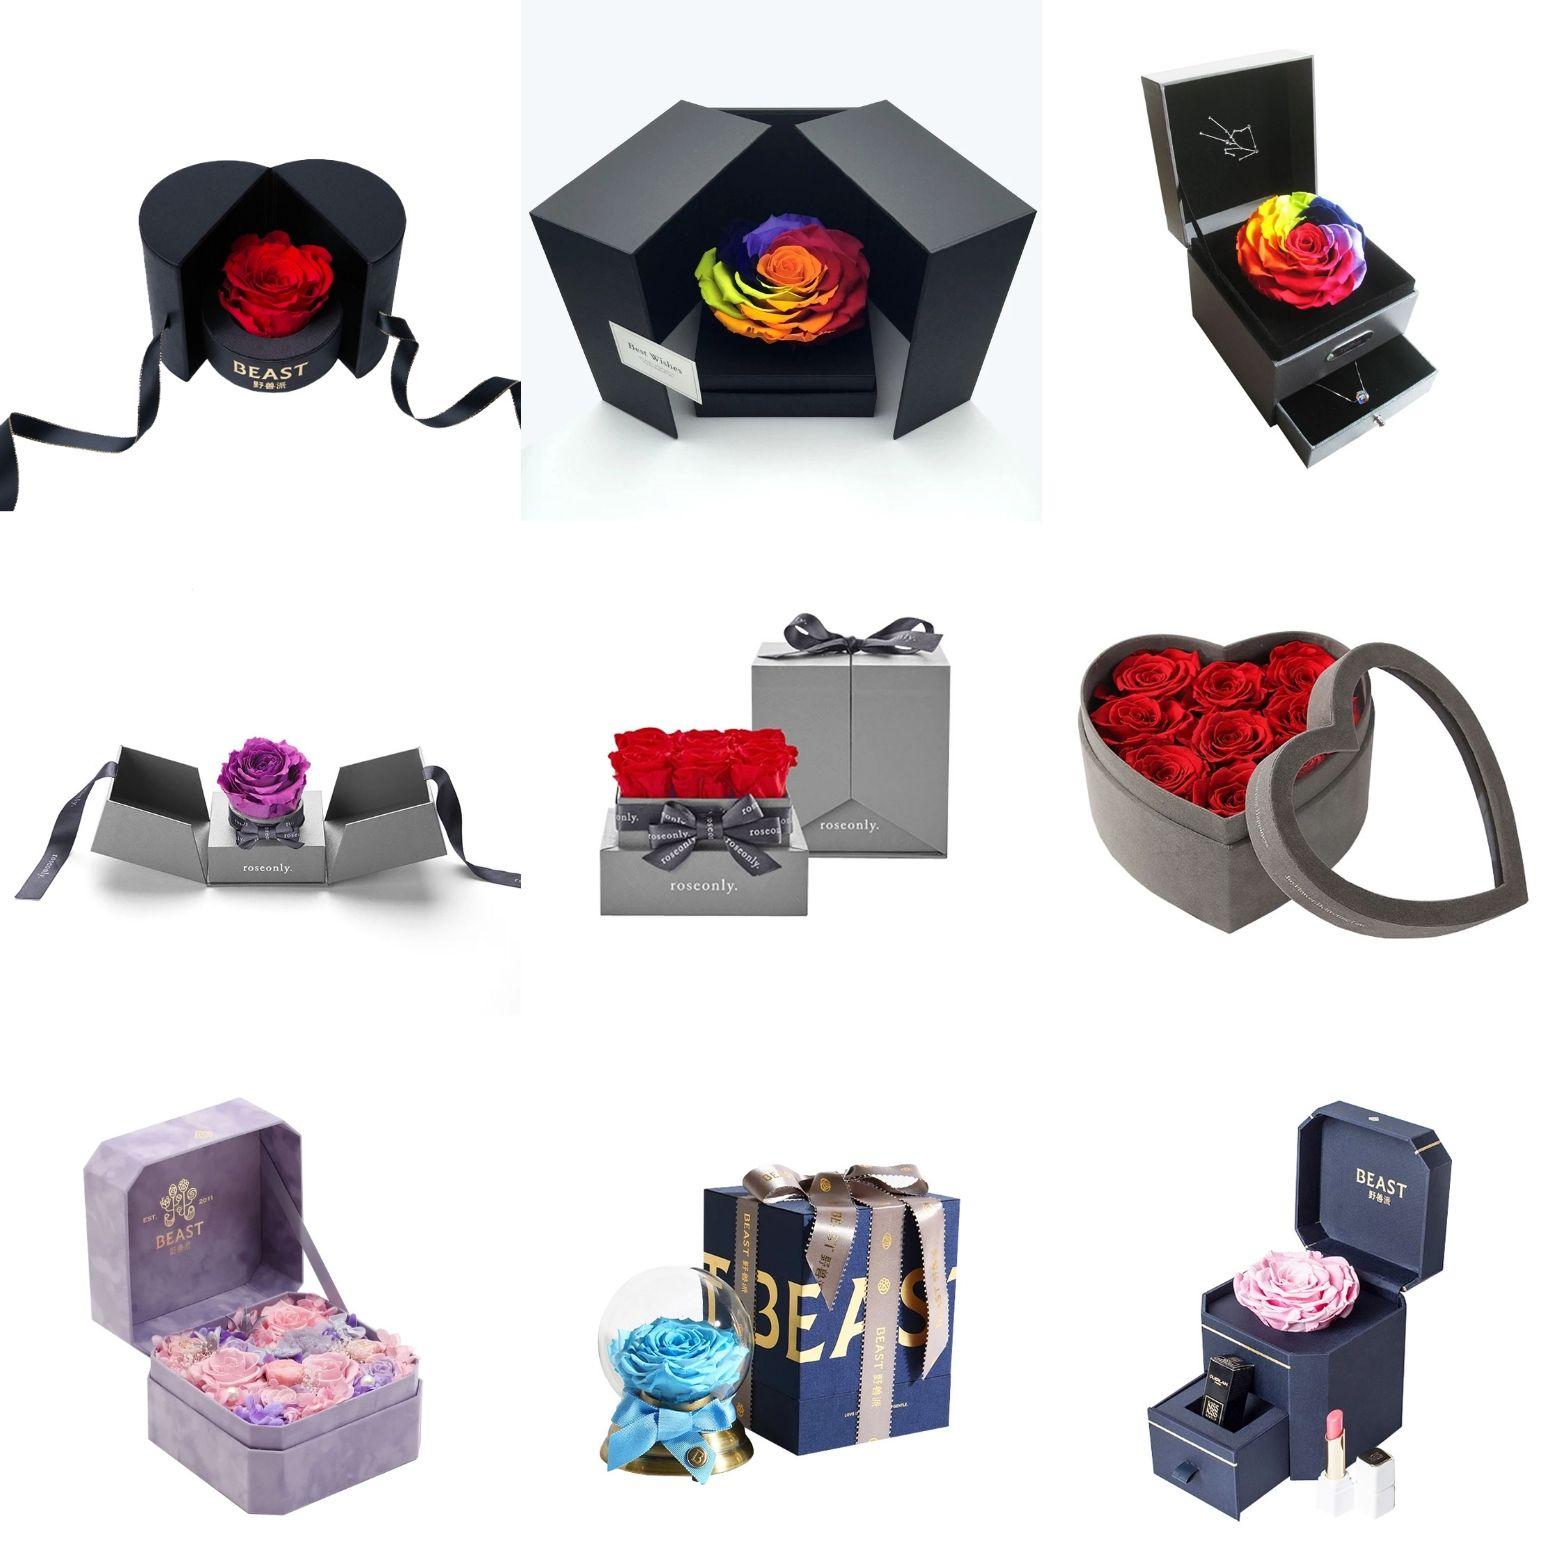 luxury flower rose gift boxes Flower boxes, Flower